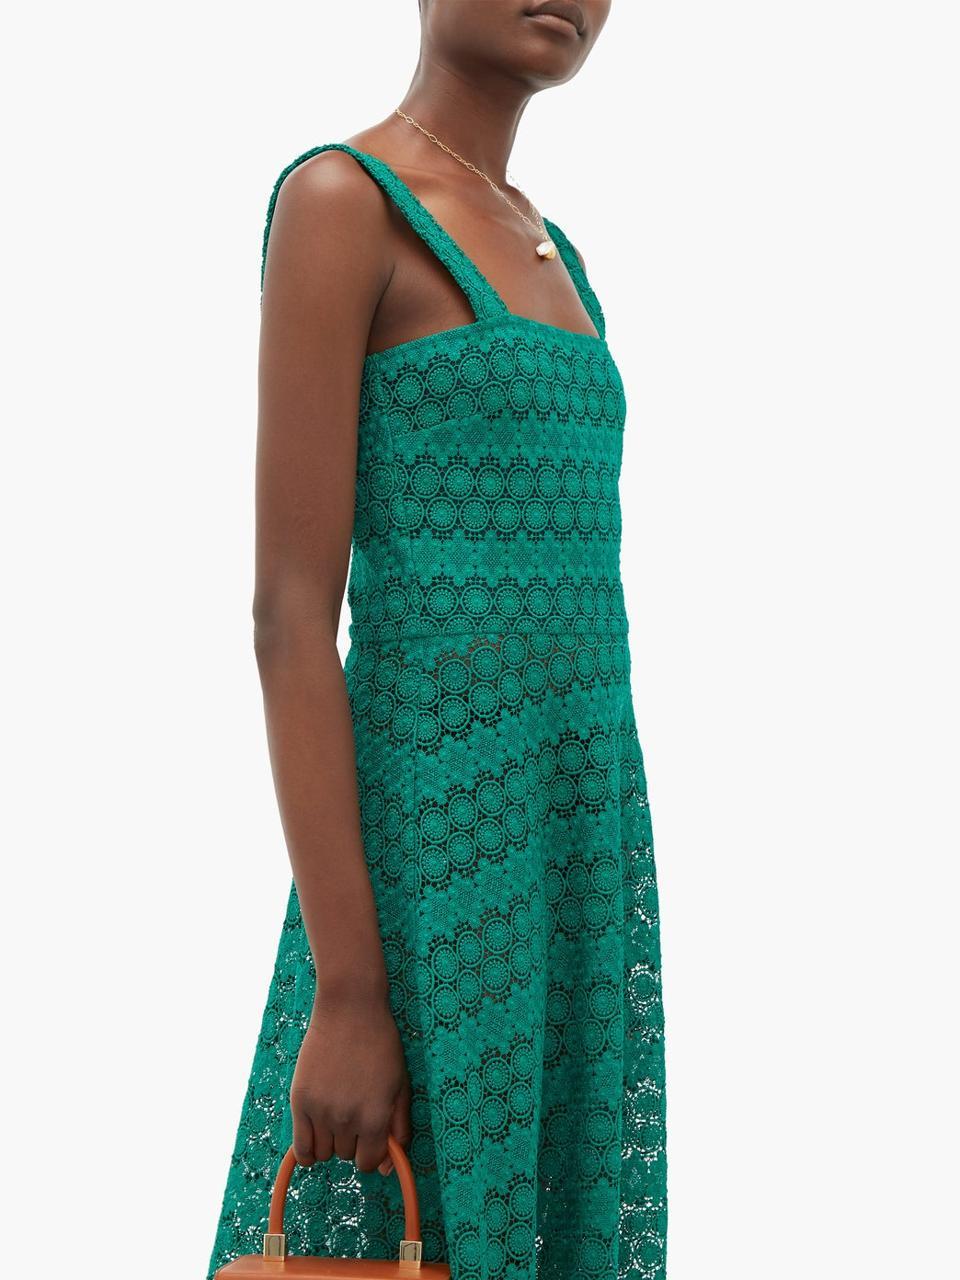 Lucinda Macramé-Lace Maxi Dress by Gioia Bini: